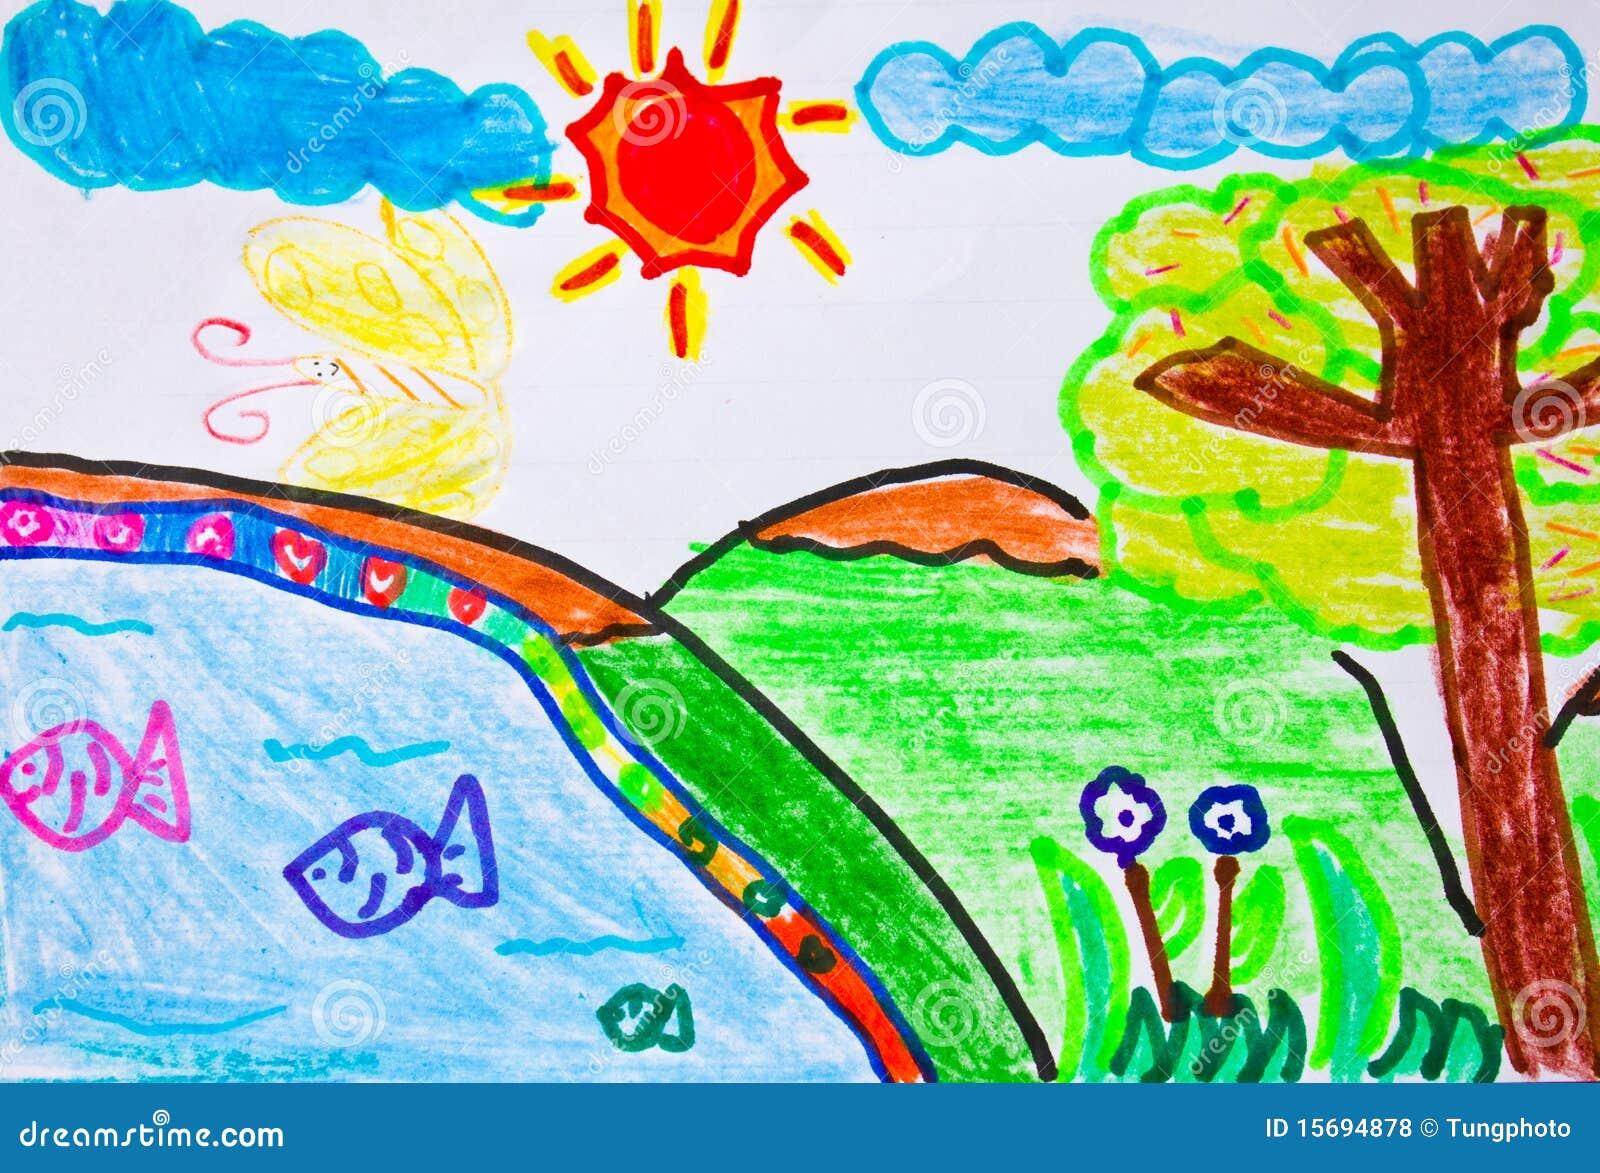 Kid Art Royalty Free Stock Photos Image 15694878